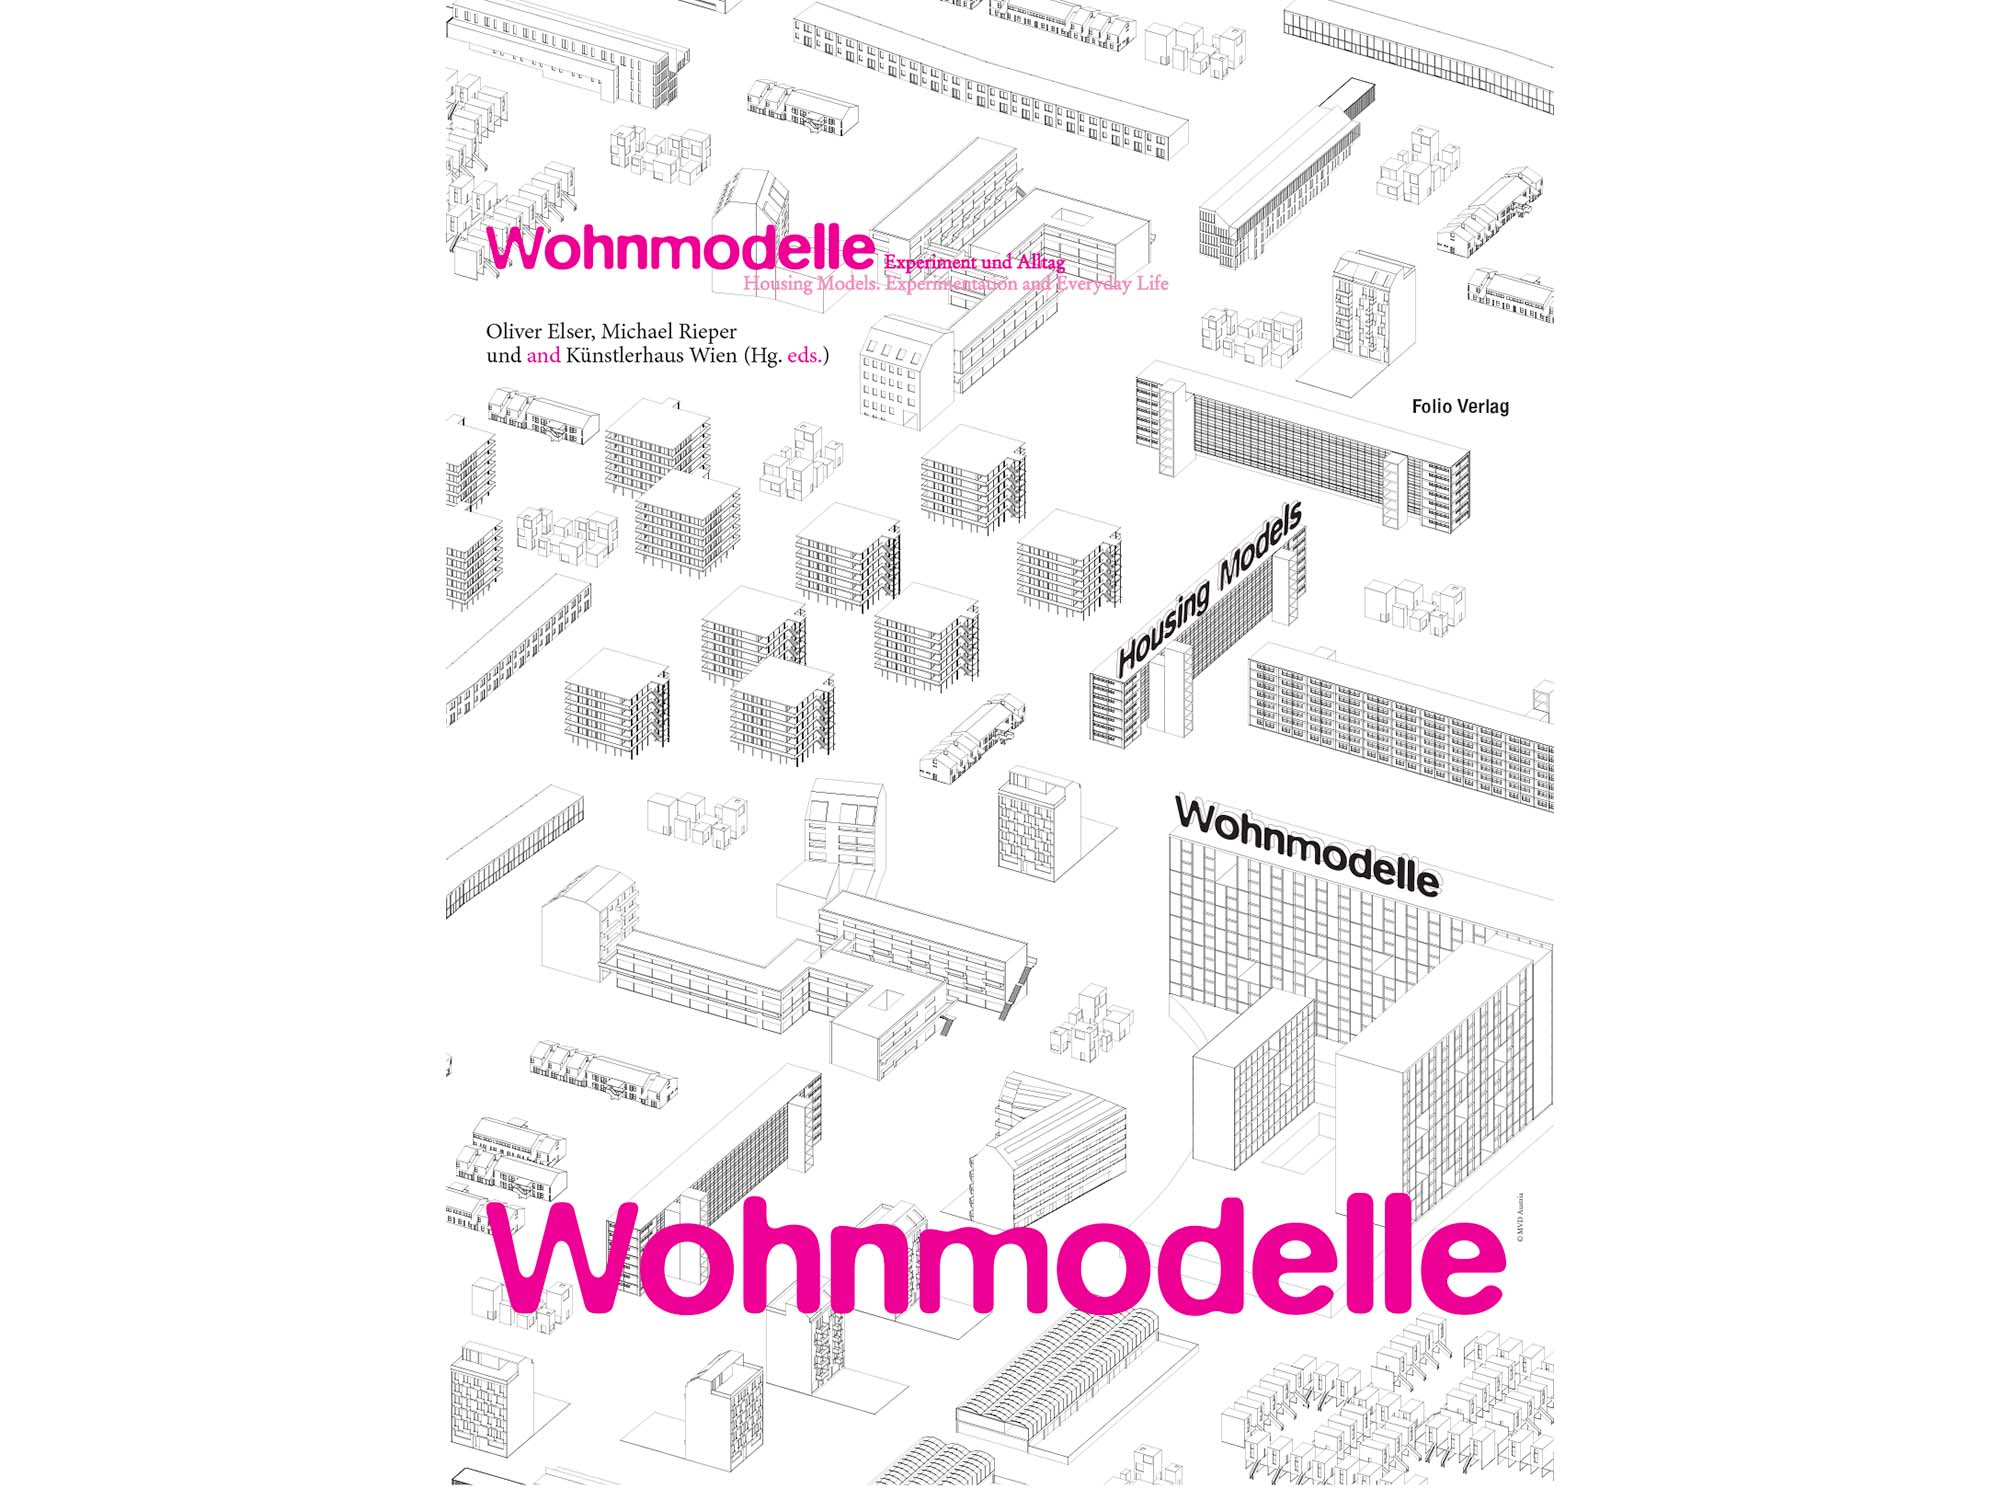 wohnmodelle_presse_auszug-1.jpg